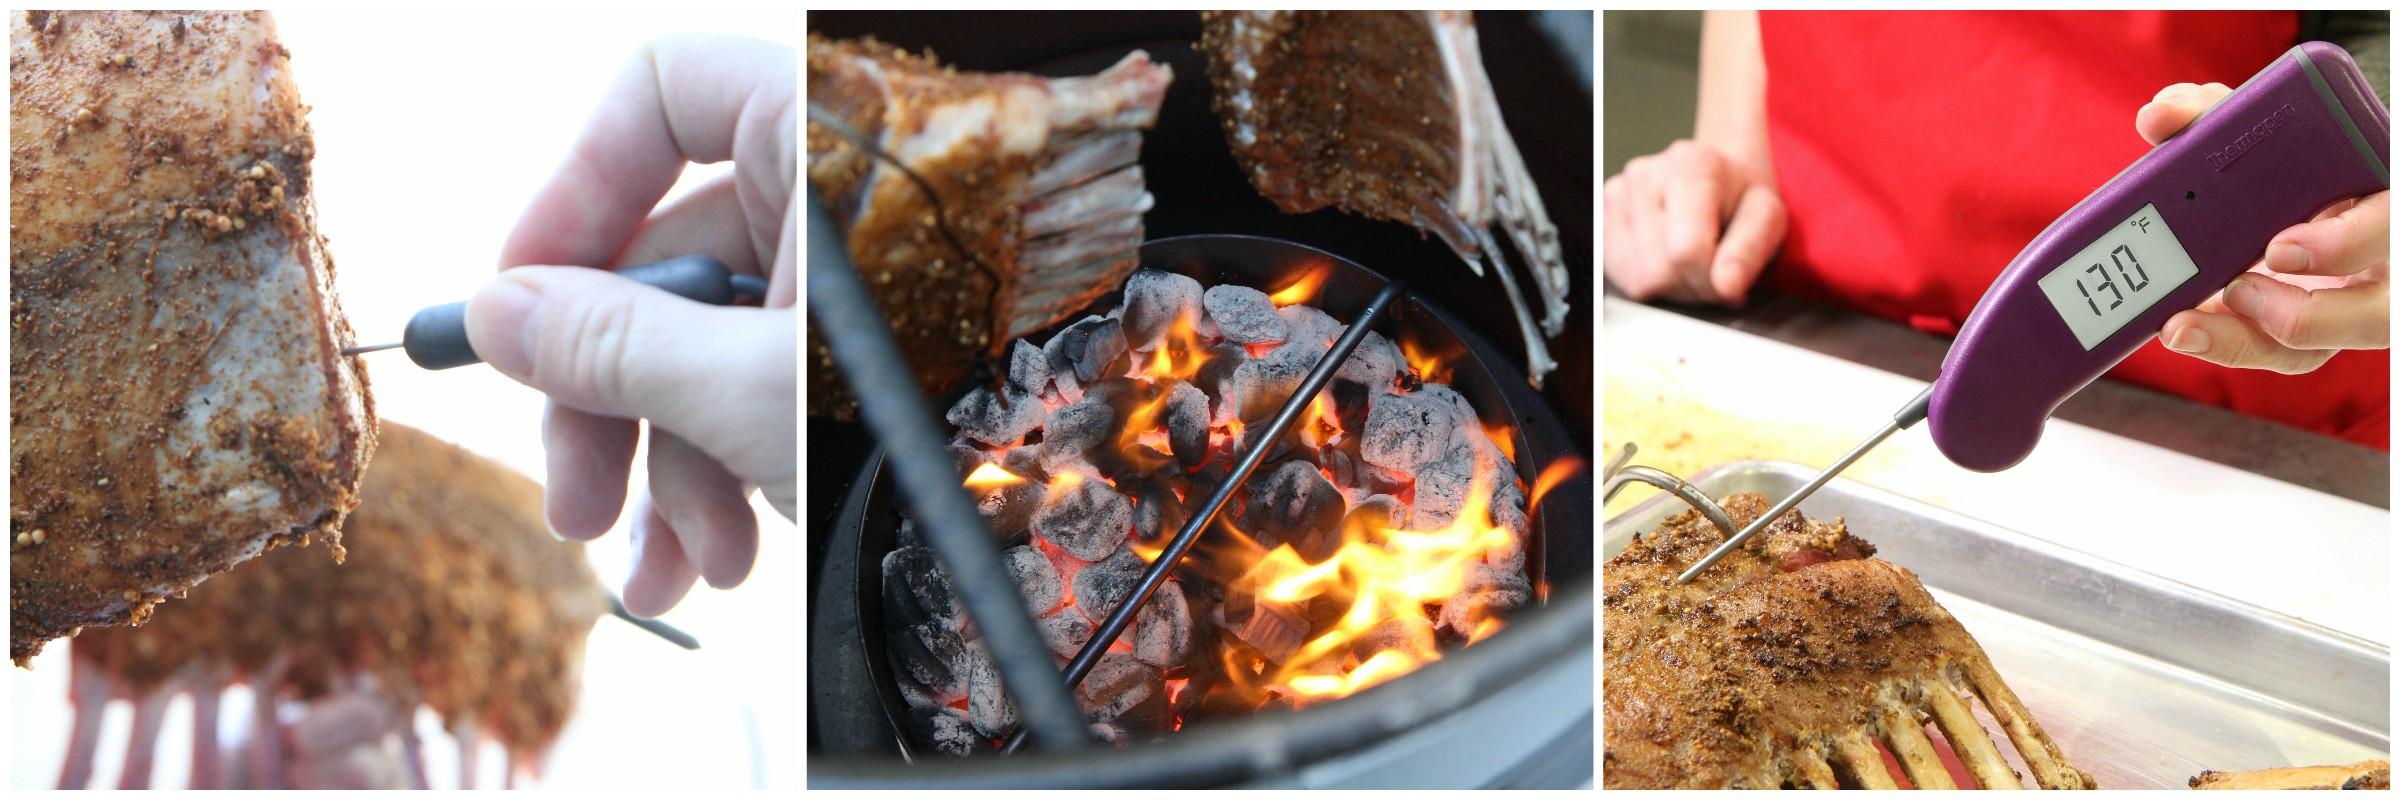 Lamb Collage 4 - Rack of Lamb cooking temperature